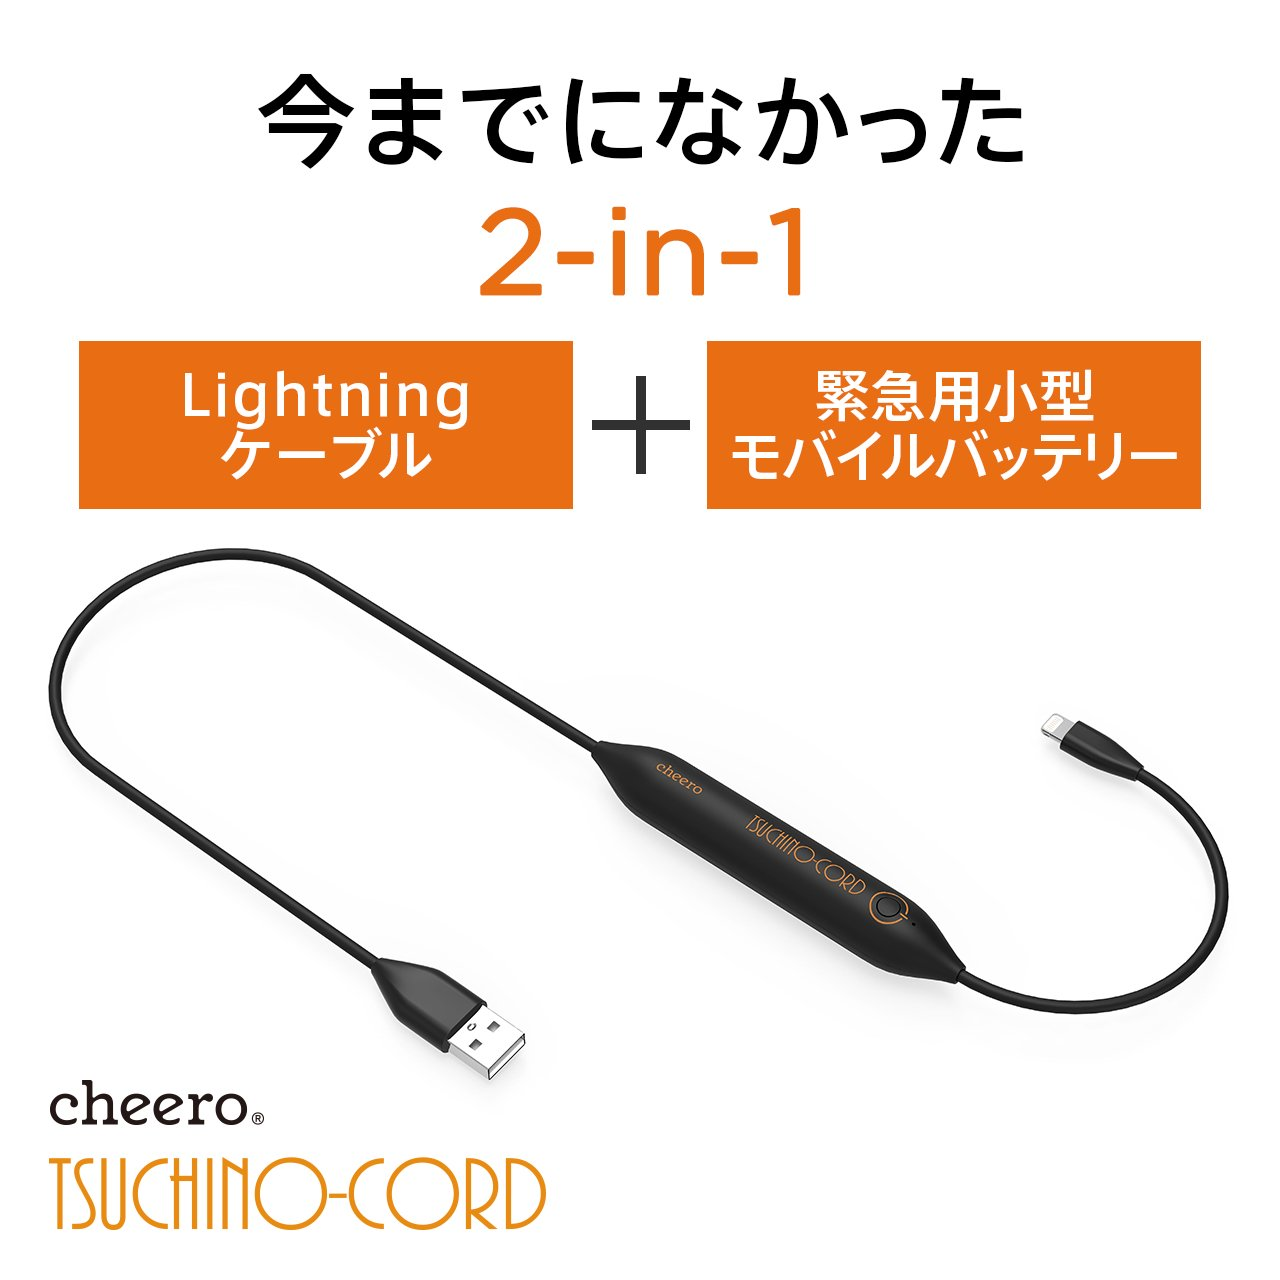 cheero Tsuchino-cord 450mAh ライトニングケーブル & 緊急用小型 モバイルバッテリー 2-in-1 MFI認証 - (ブラック) CHE-085-BK 100cm